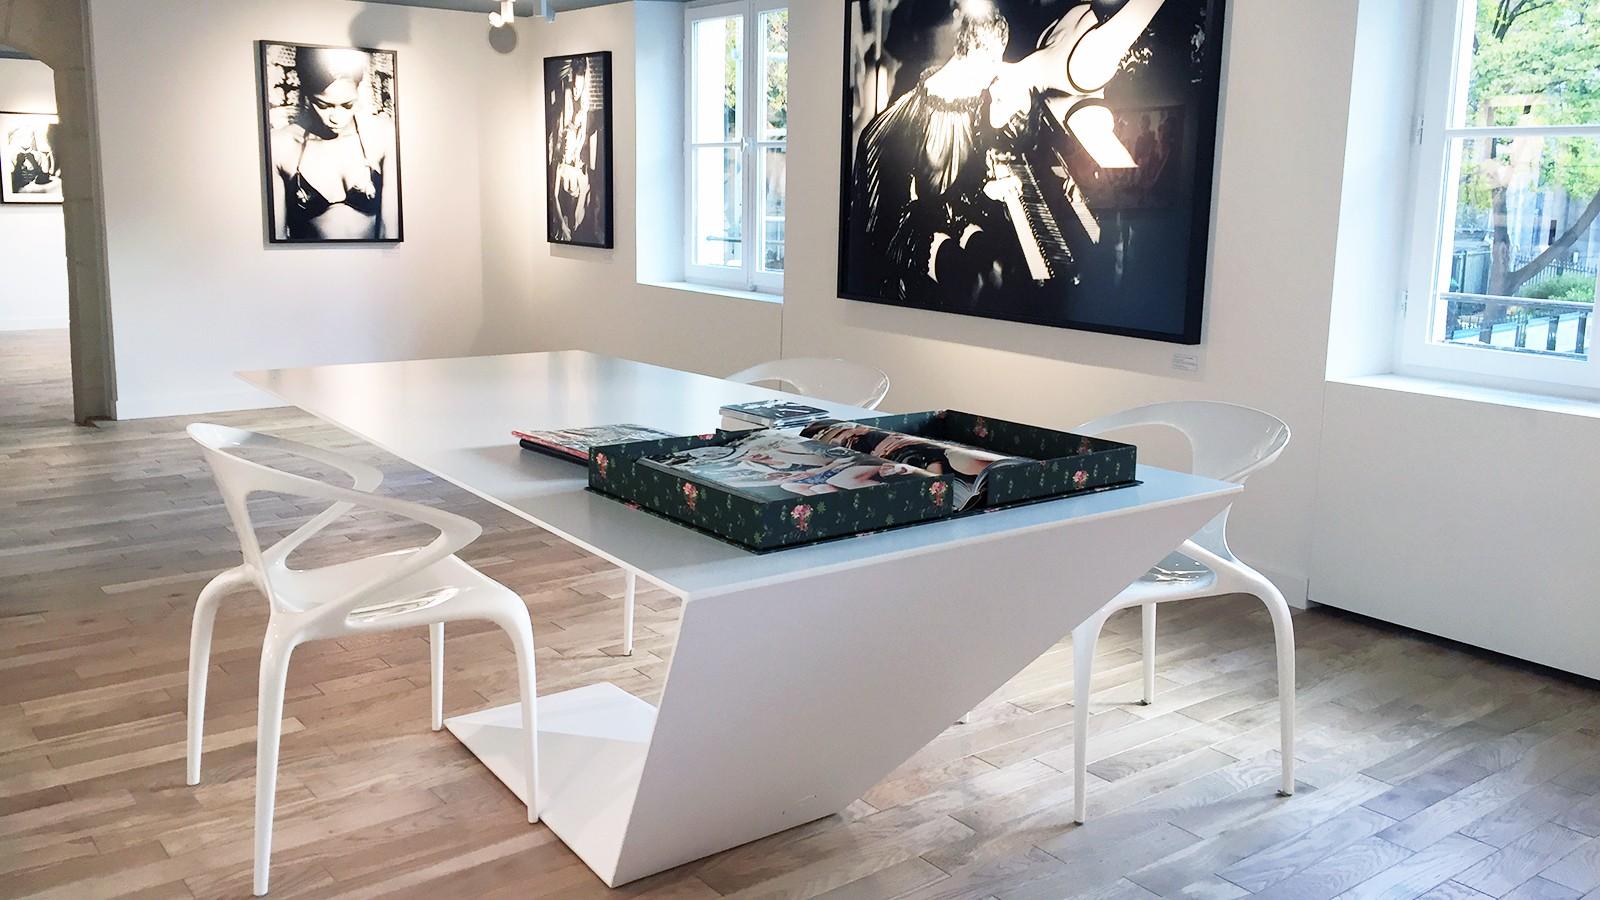 EFI Design Librairie La Hune Saint Germain Des Pres Efi Design 1340